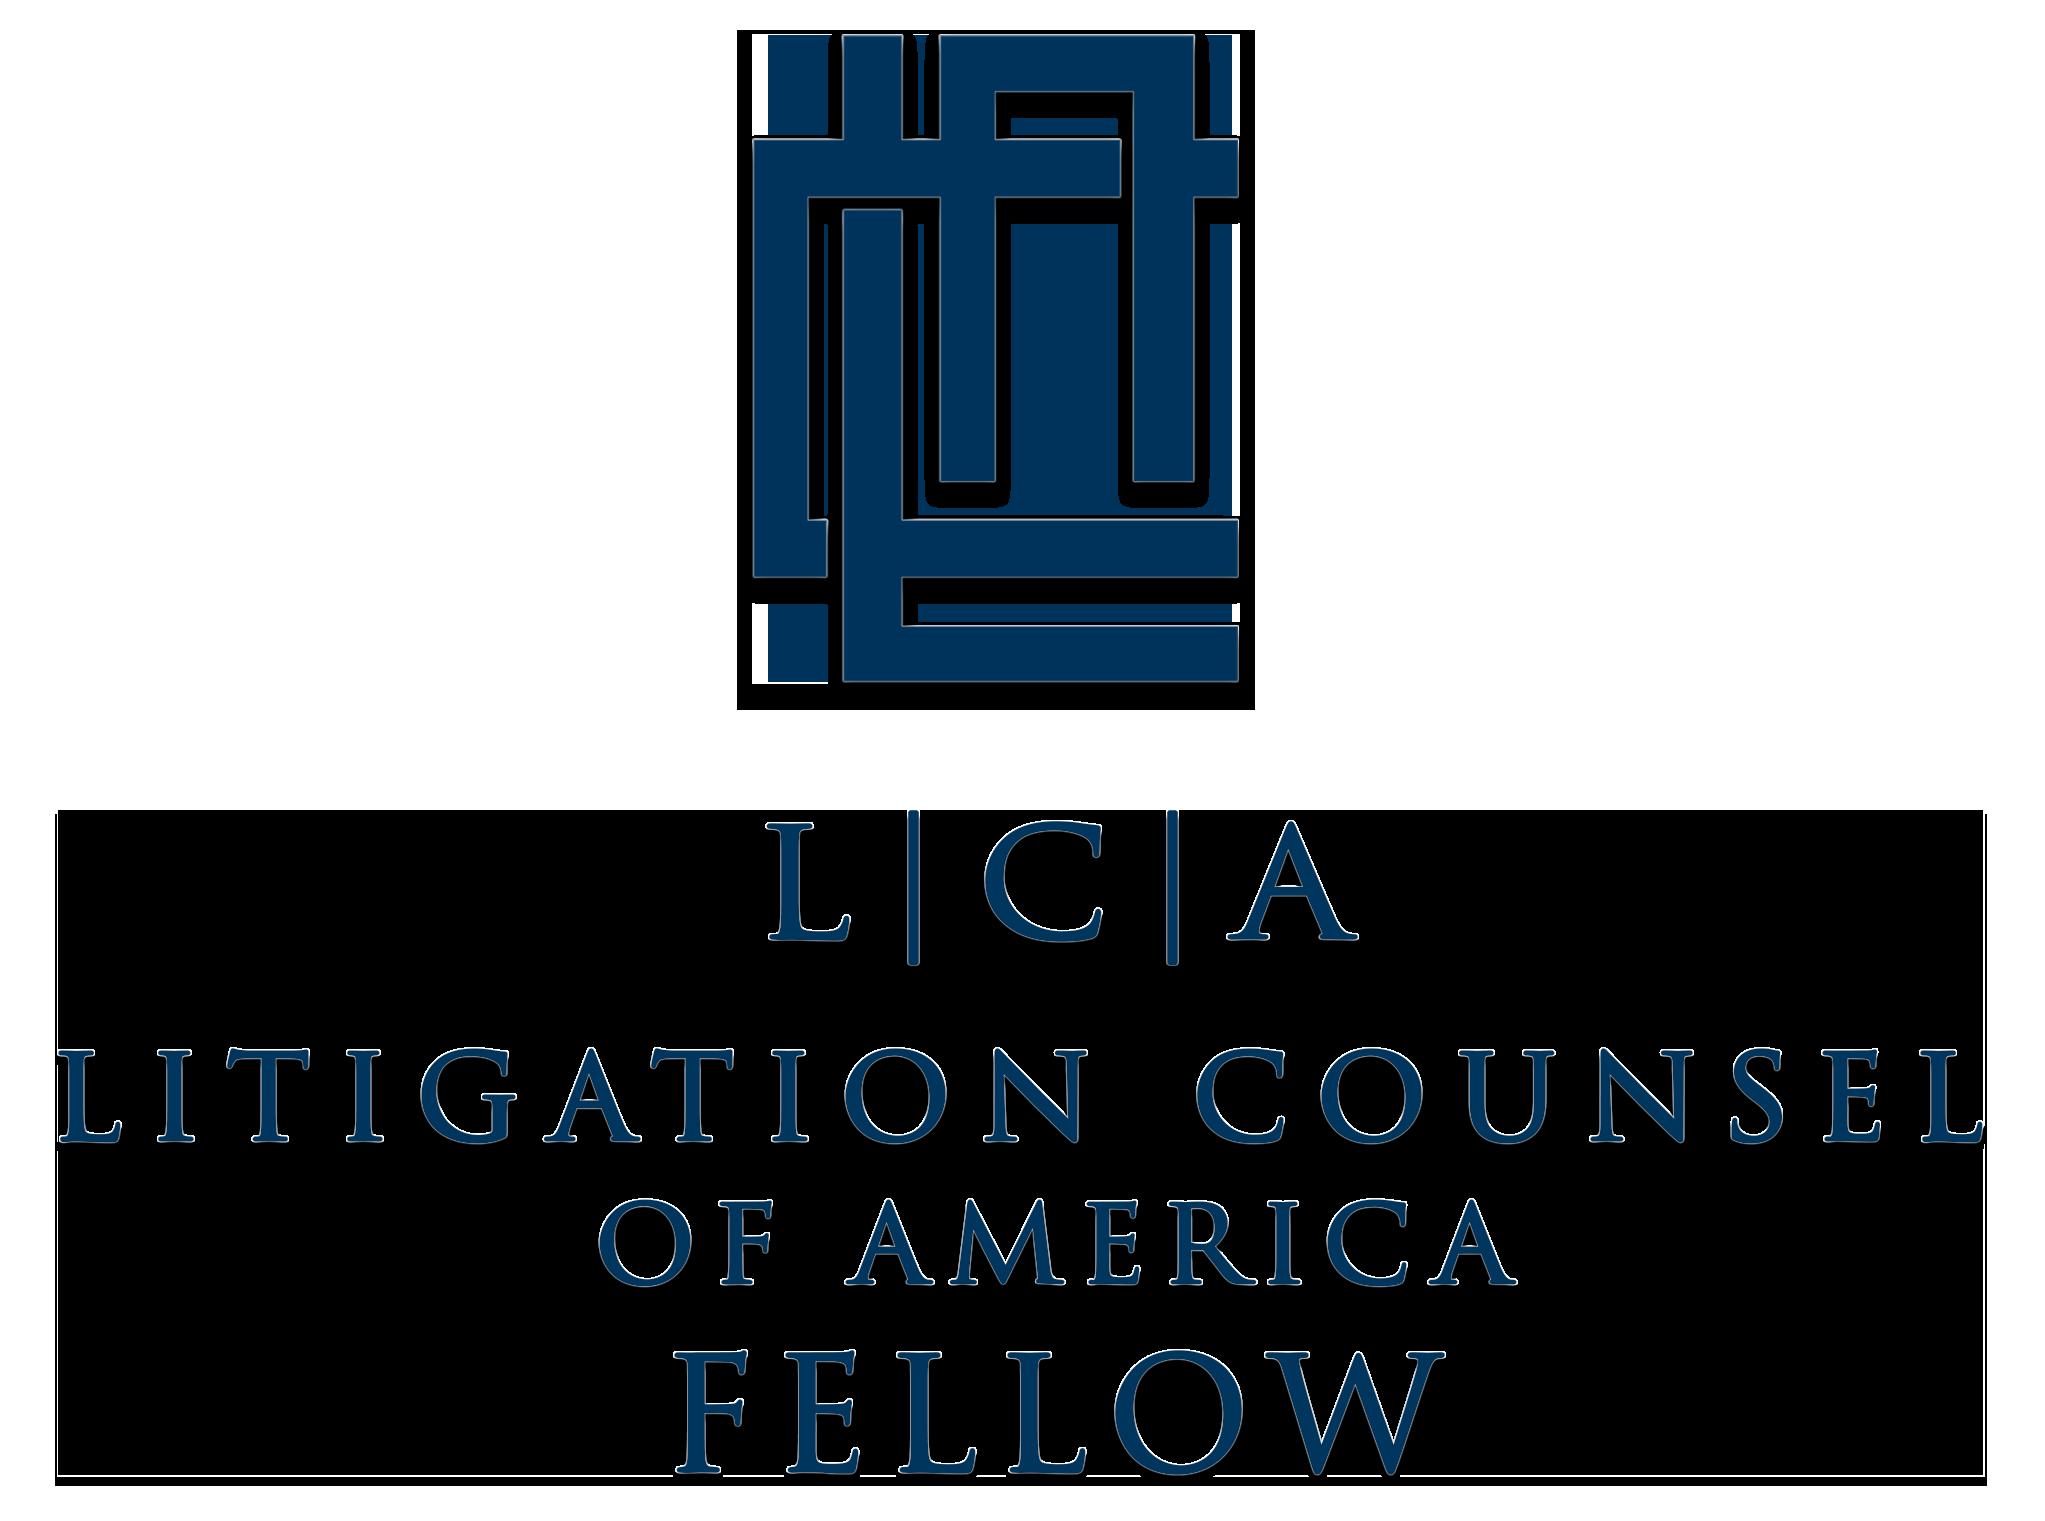 Litigation Counsel of America Fellowship Logo